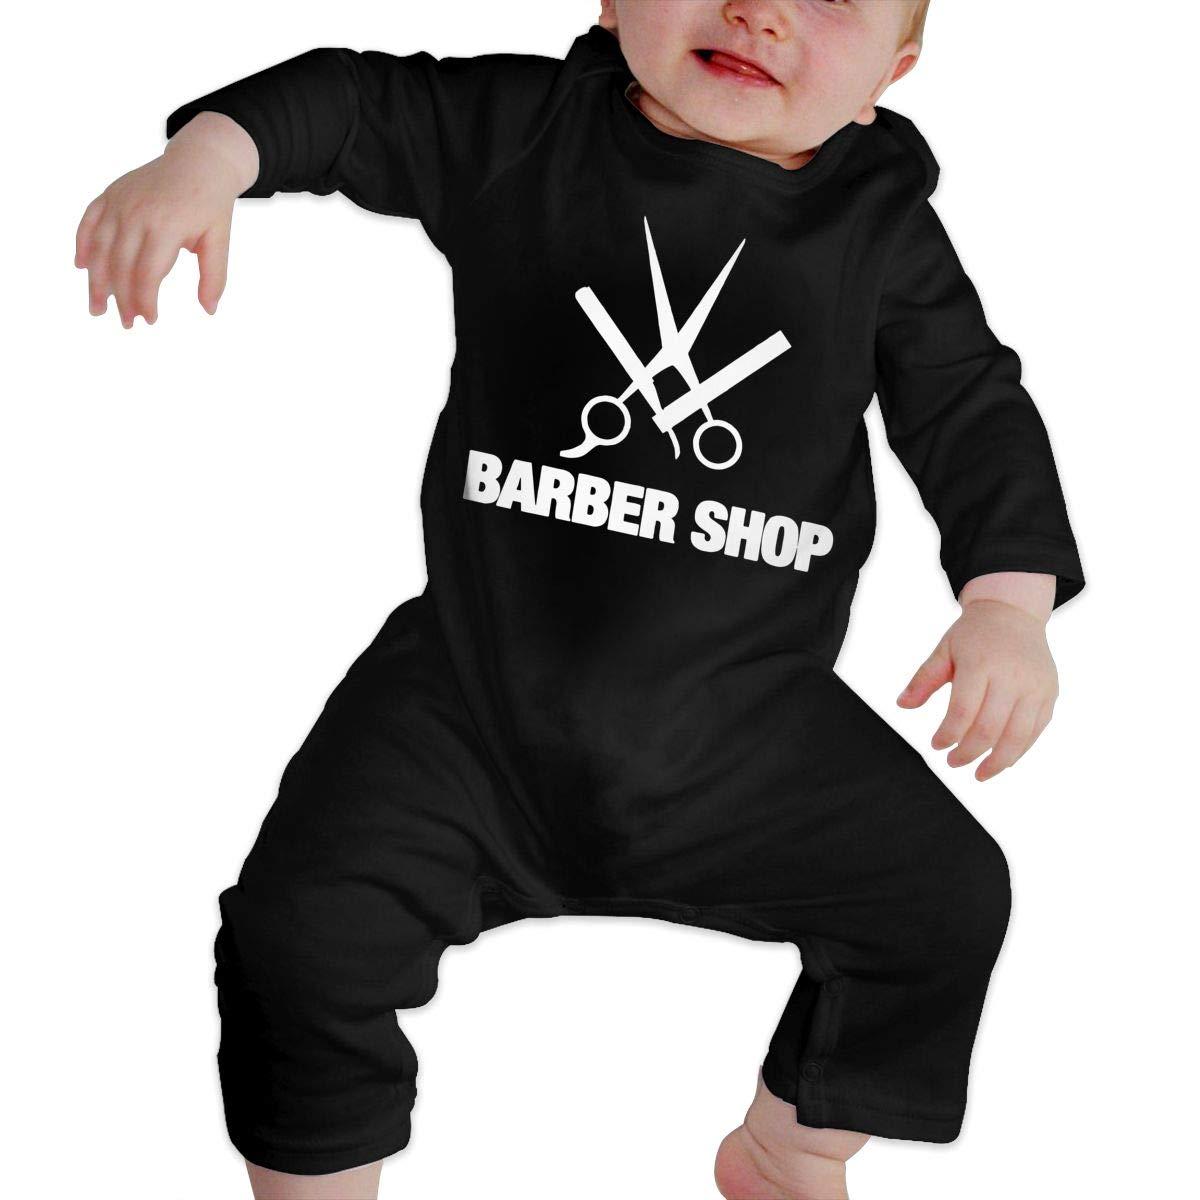 Fashion Barber Shop Sleepwear U99oi-9 Long Sleeve Cotton Bodysuit for Baby Boys and Girls